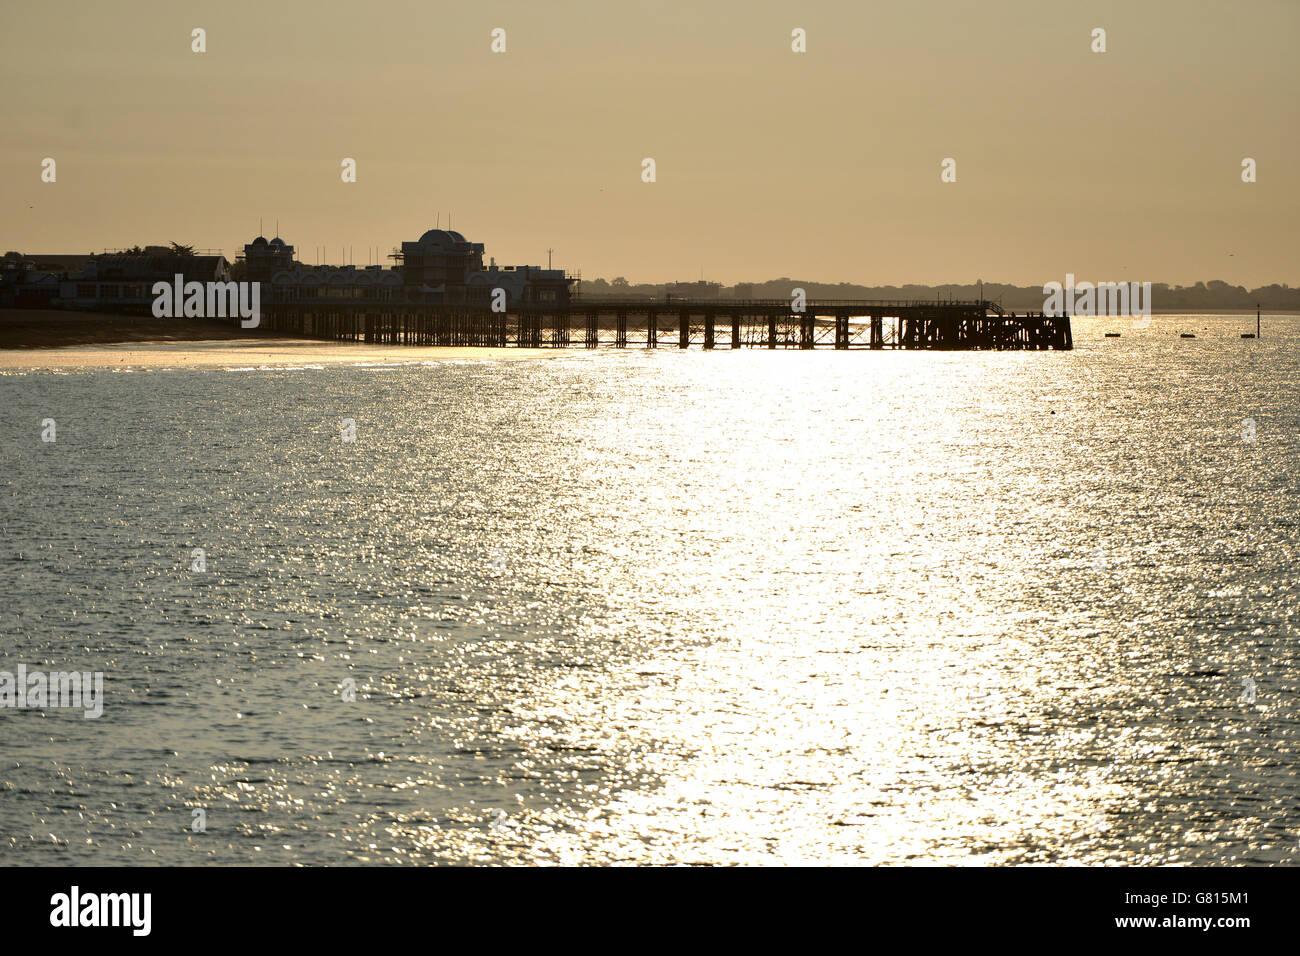 South Parade Pier, Southsea, UK - Stock Image